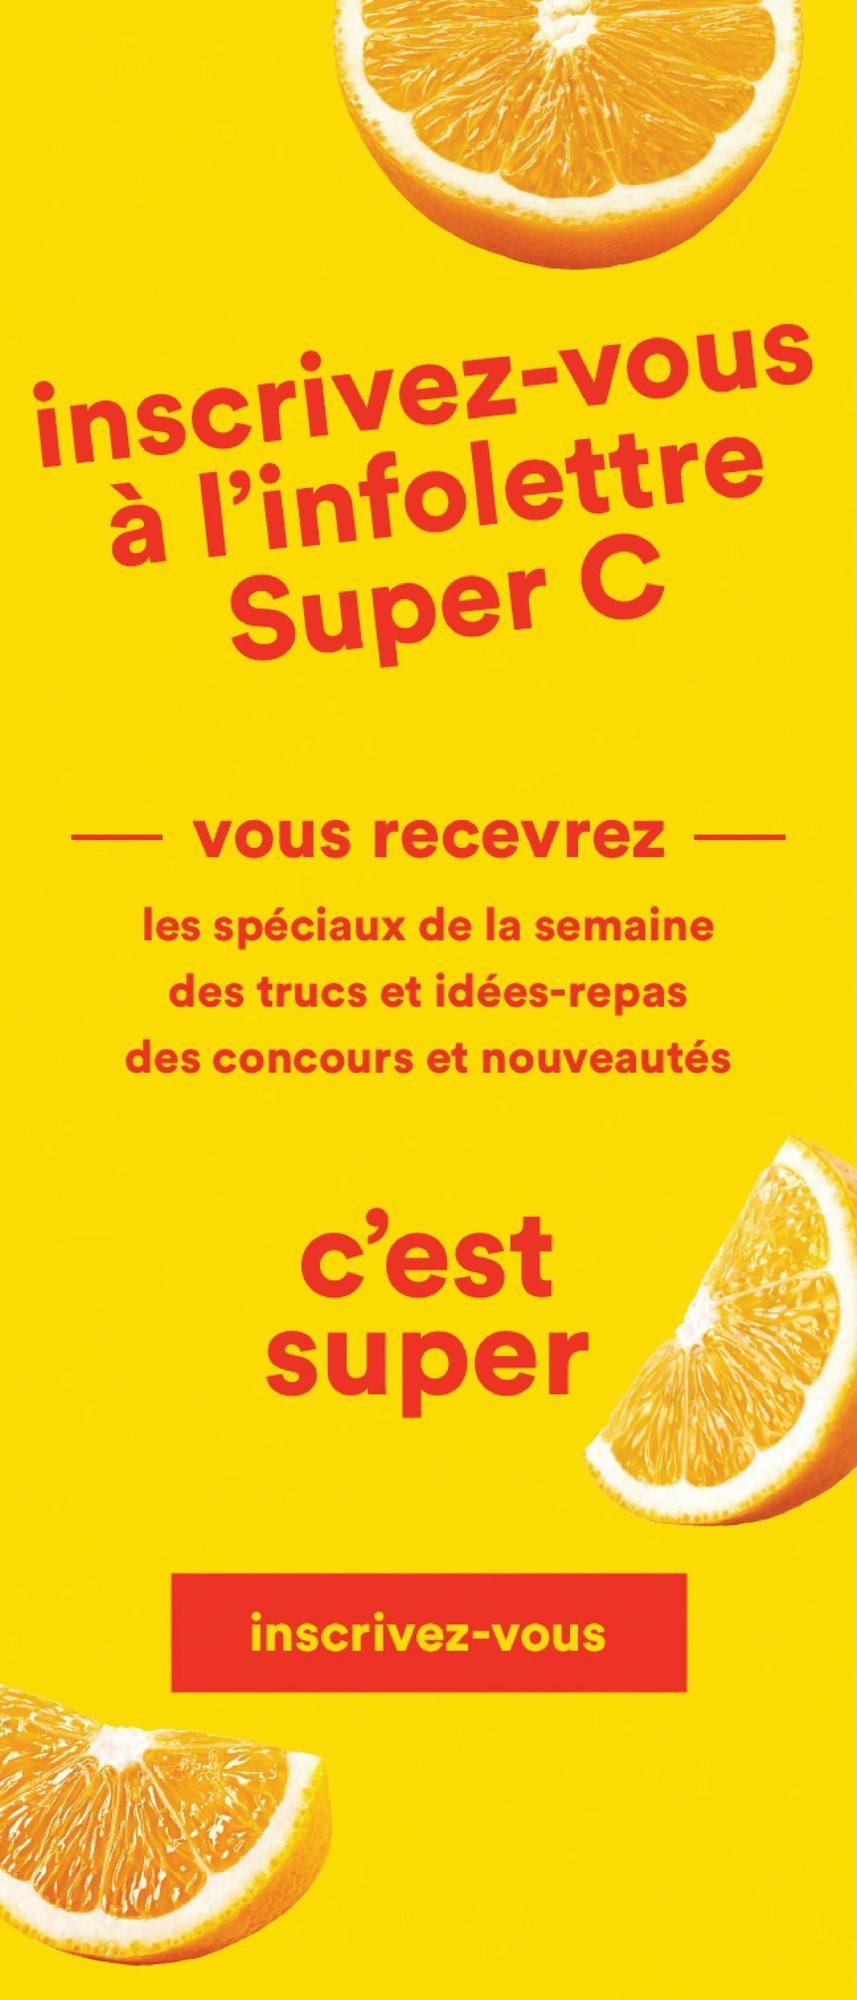 Super C - Weekly Flyer Specials - Page 13